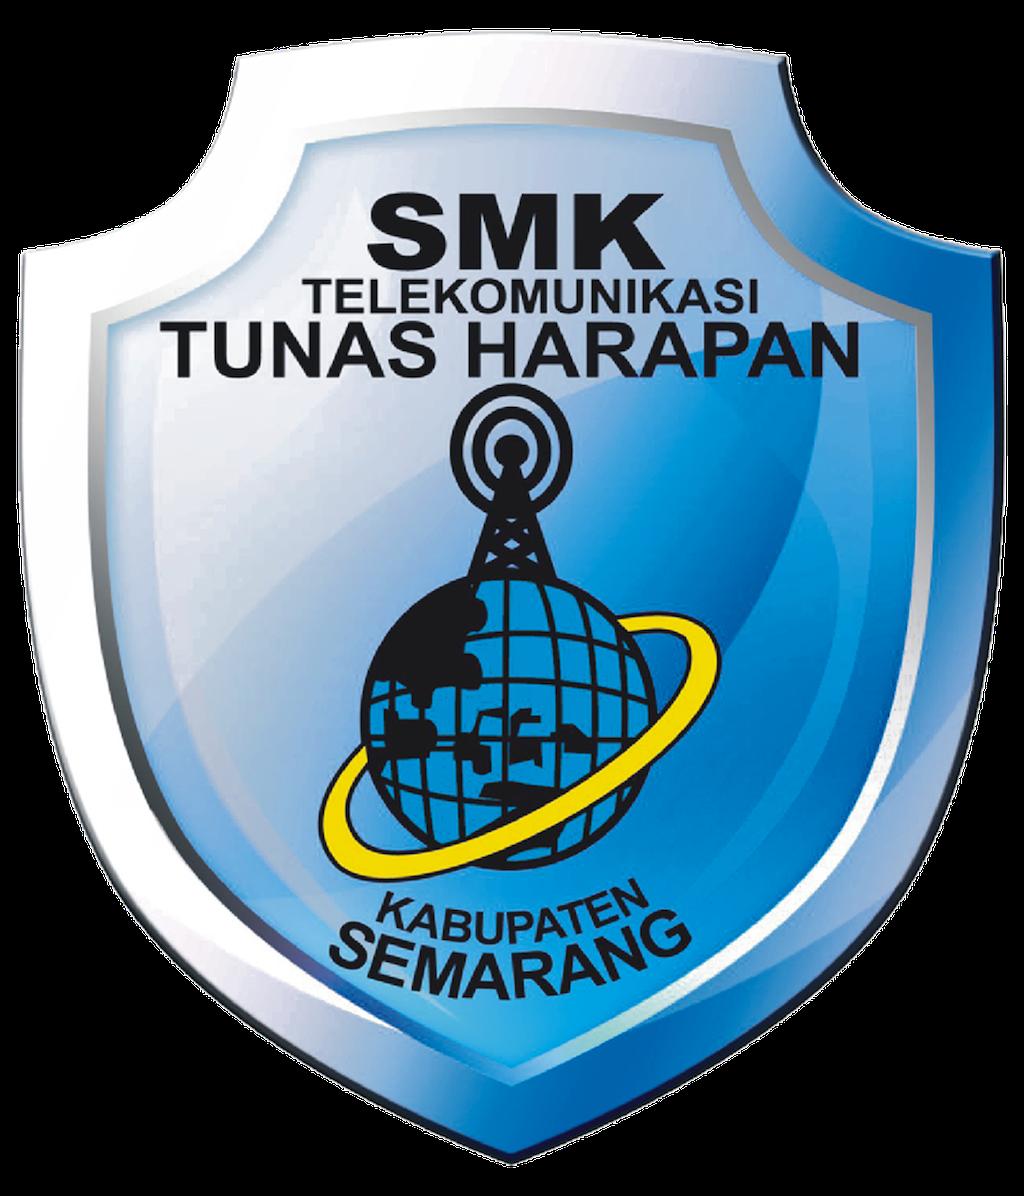 SMK Telekomunikasi Tunas Harapan